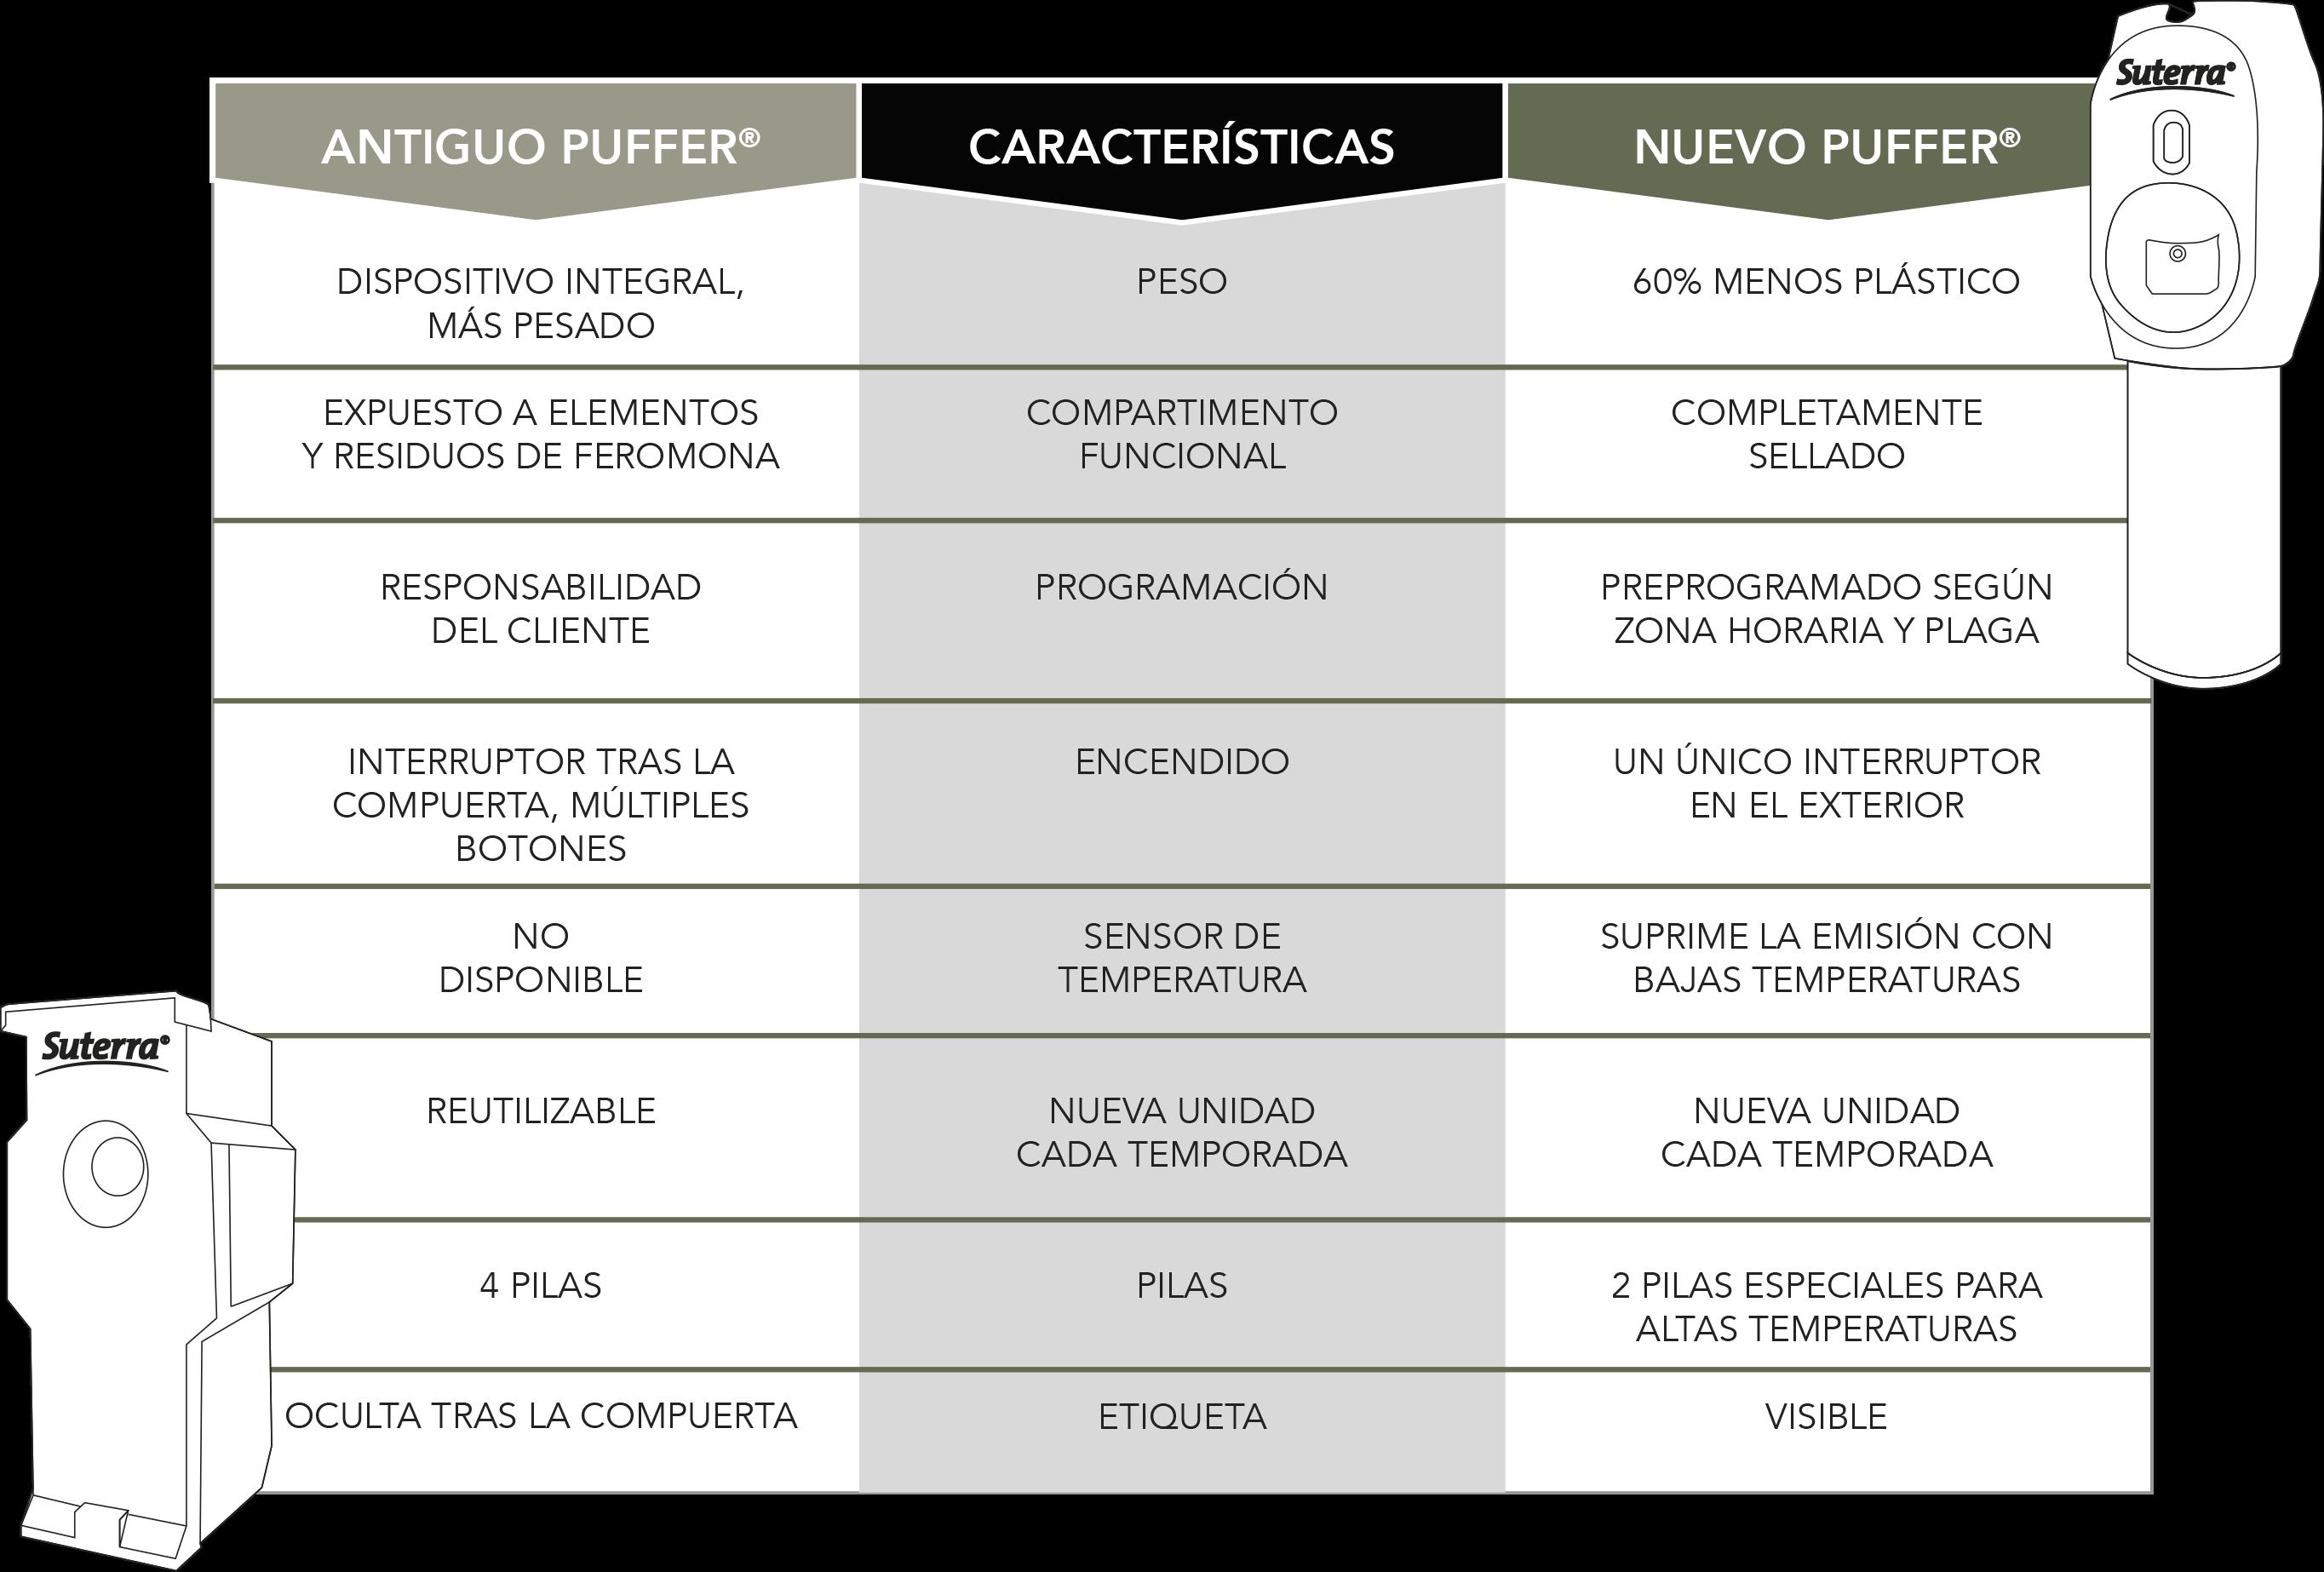 TABLA COMPARATIVA ESP-2-2